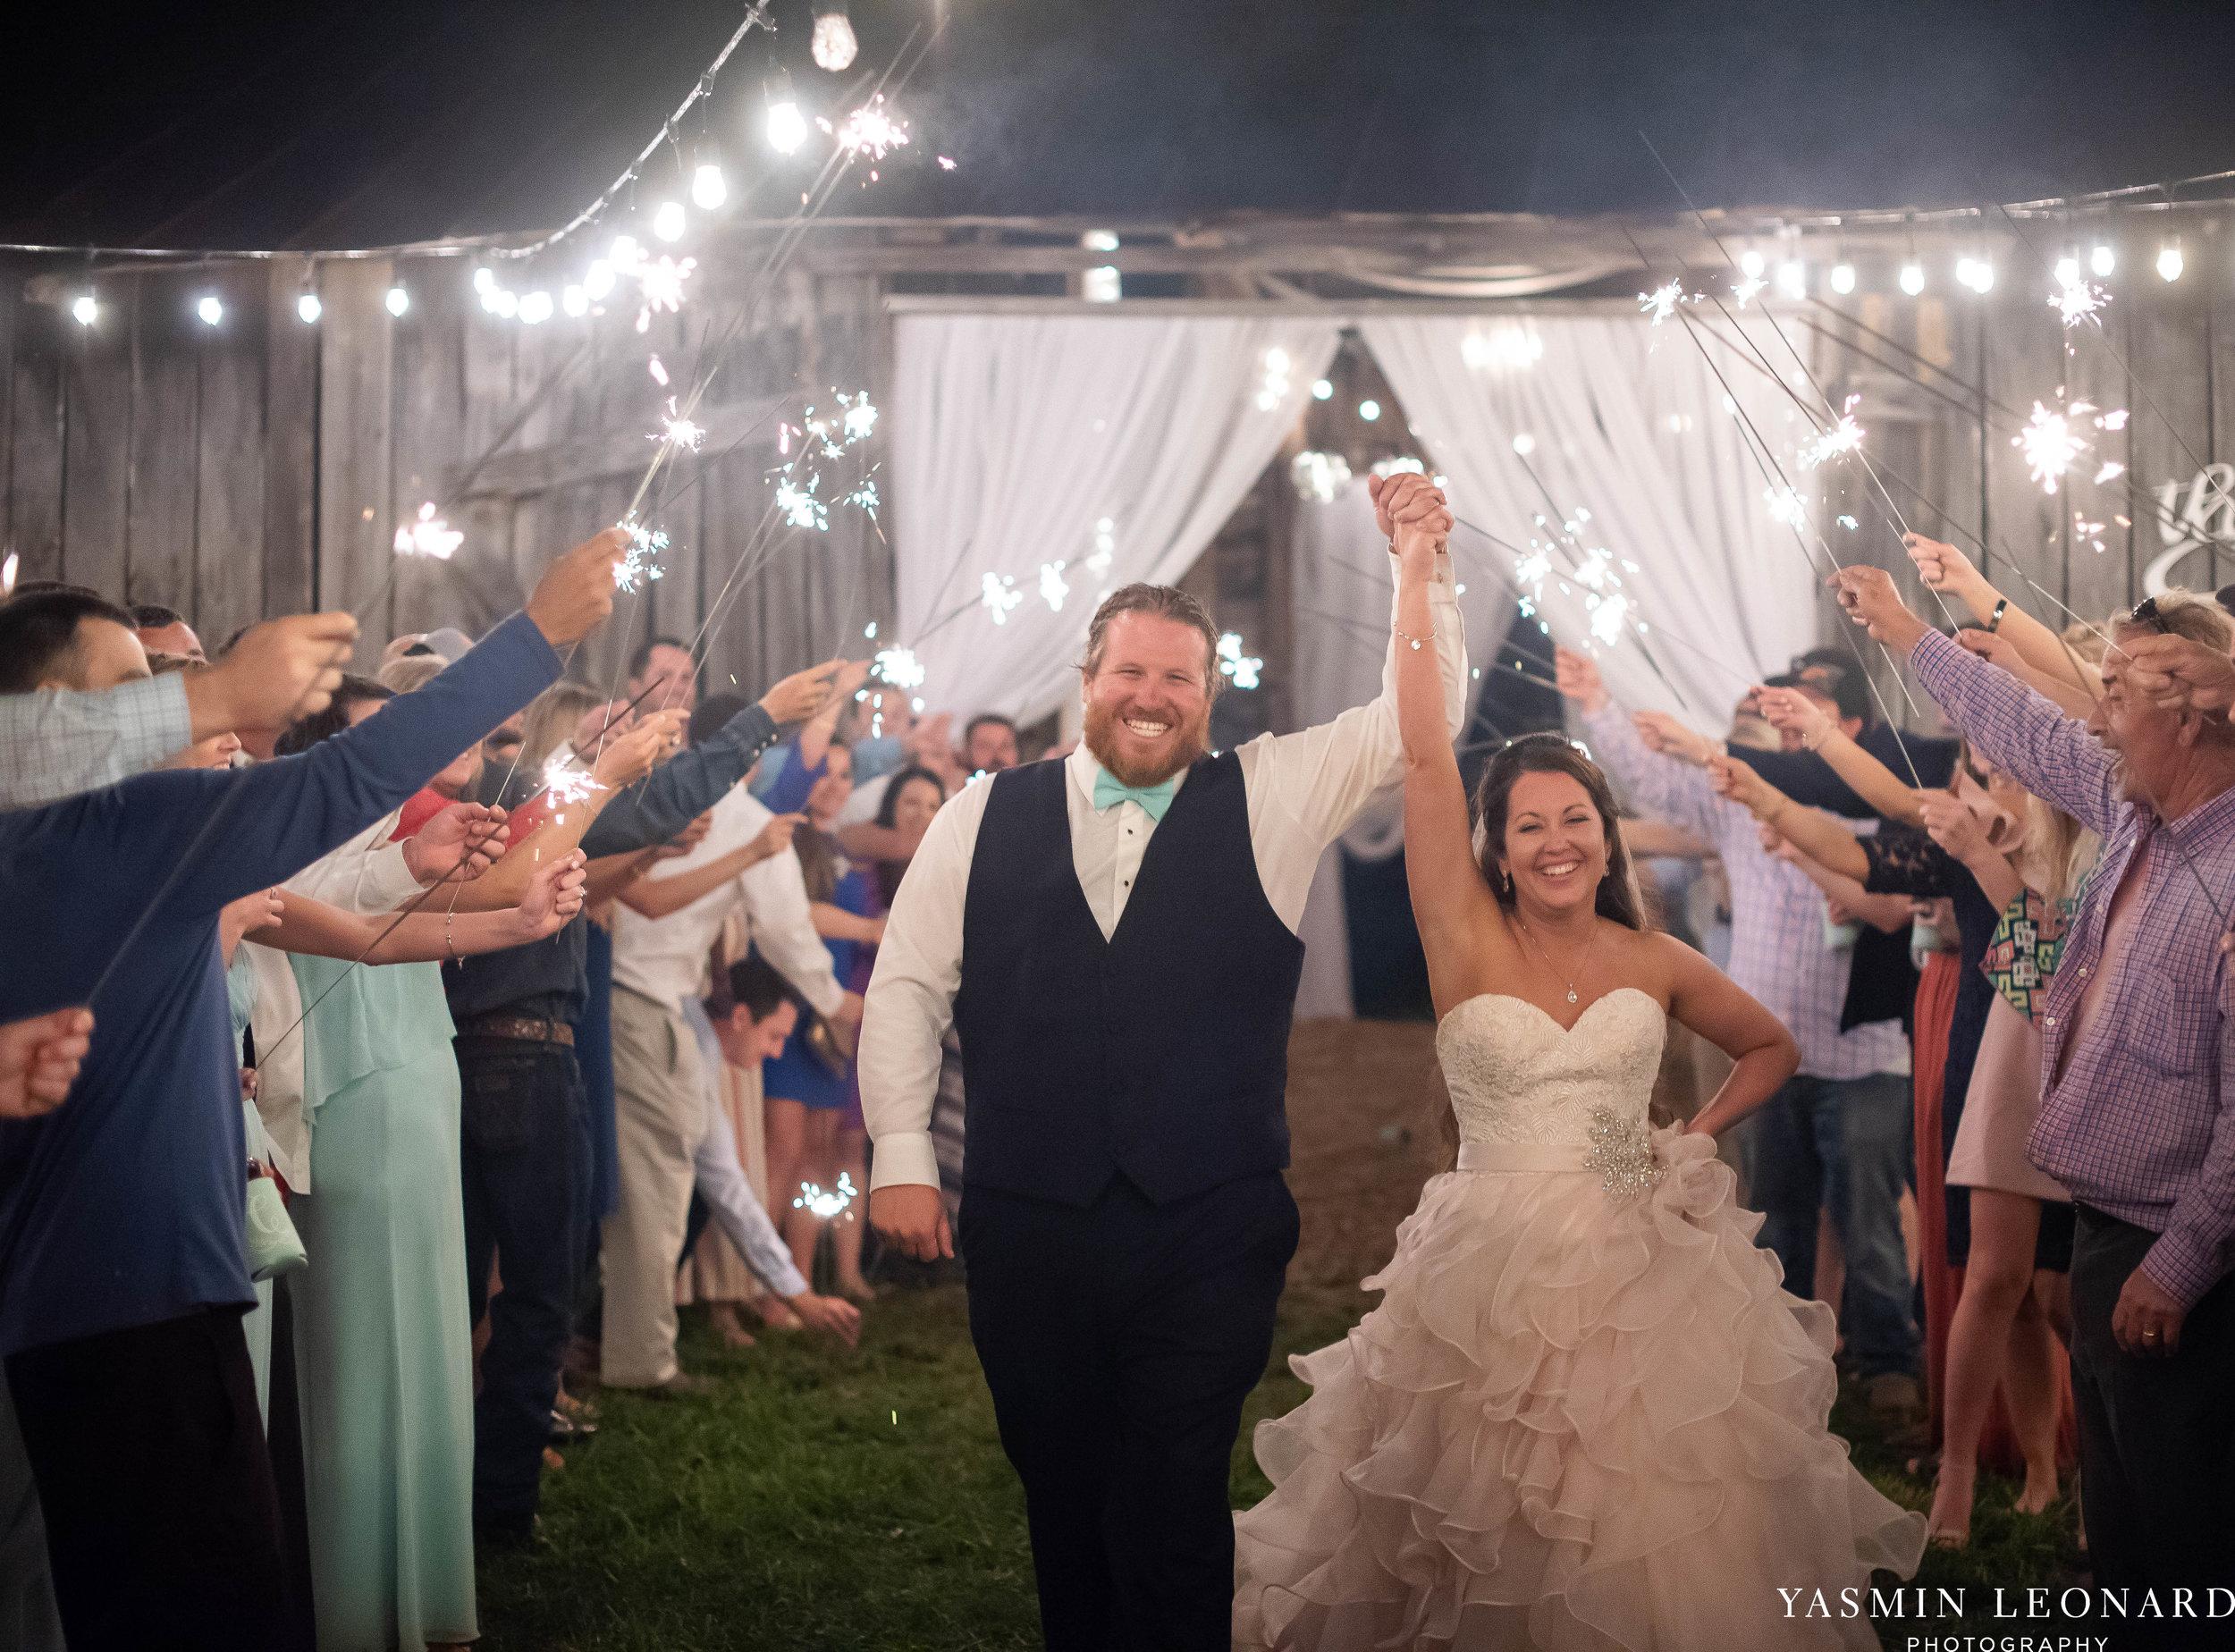 Rain on your wedding day - Rainy Wedding - Plan B for Rain - What to do if it rains on your wedding day - Wedding Inspiration - Outdoor wedding ideas - Rainy Wedding Pictures - Yasmin Leonard Photography-90.jpg